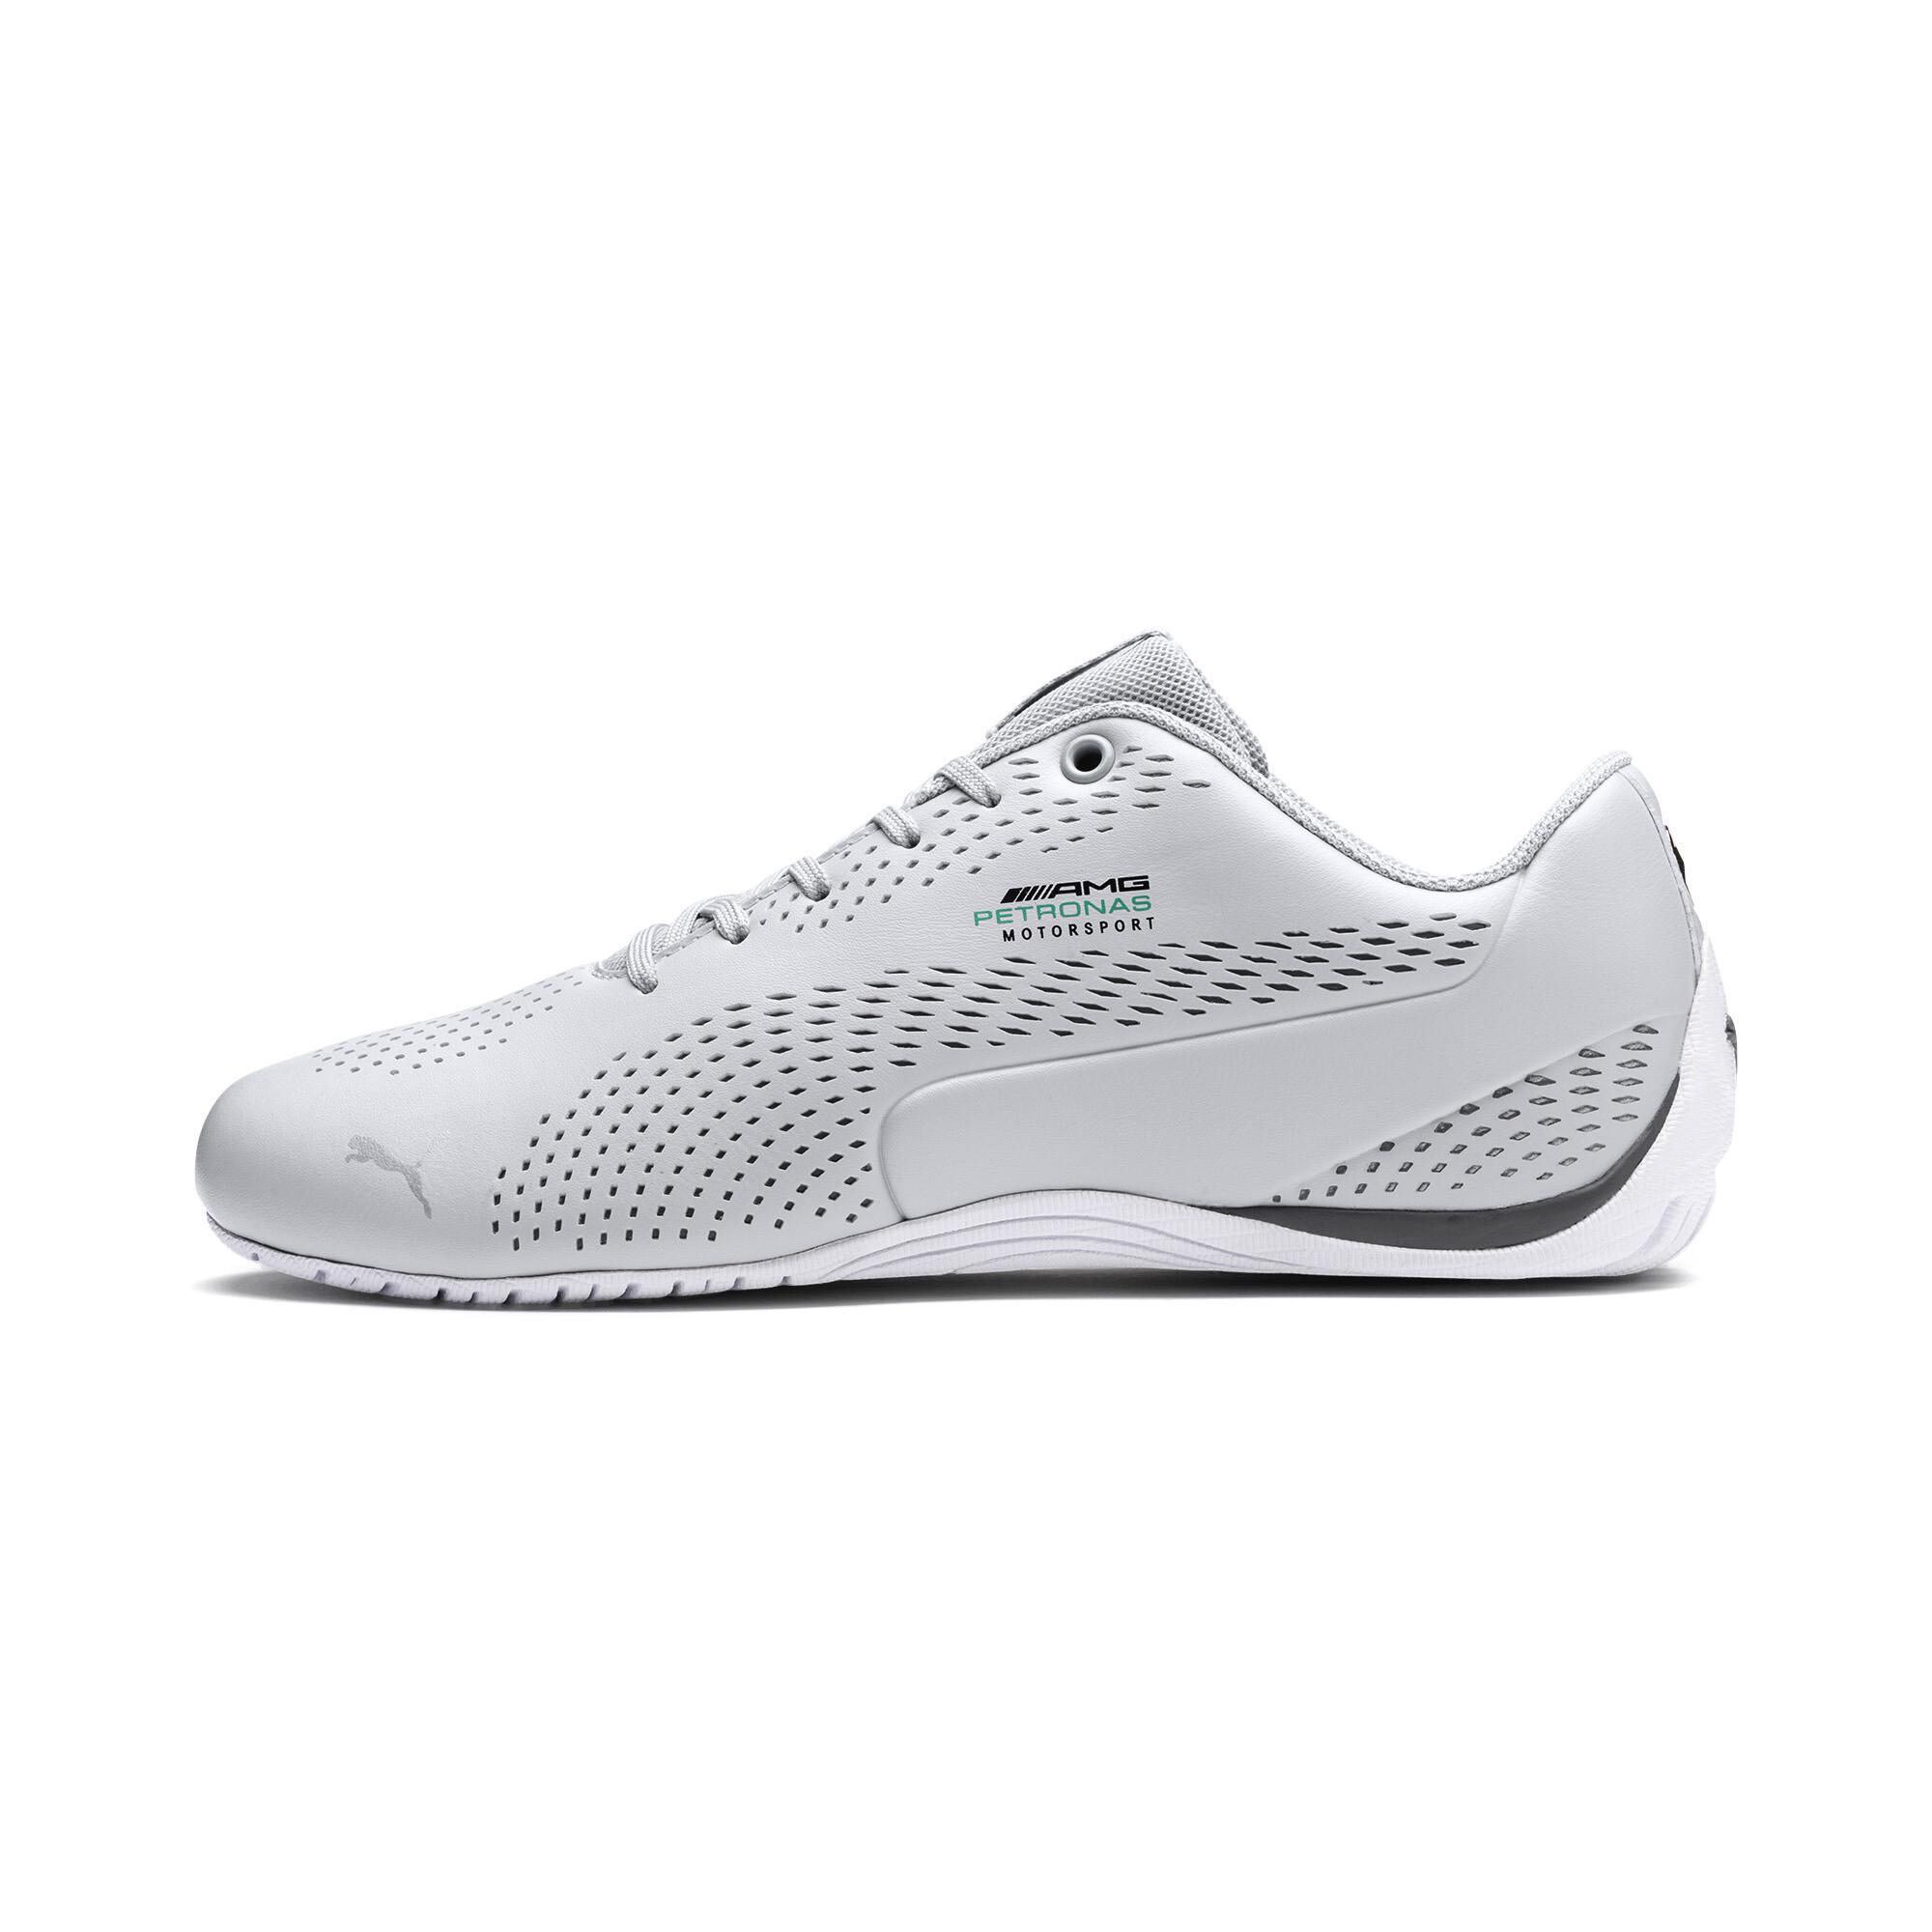 PUMA-Mercedes-AMG-Petronas-Drift-Cat-5-Ultra-II-Sneaker-Unisex-Schuhe-Neu Indexbild 4